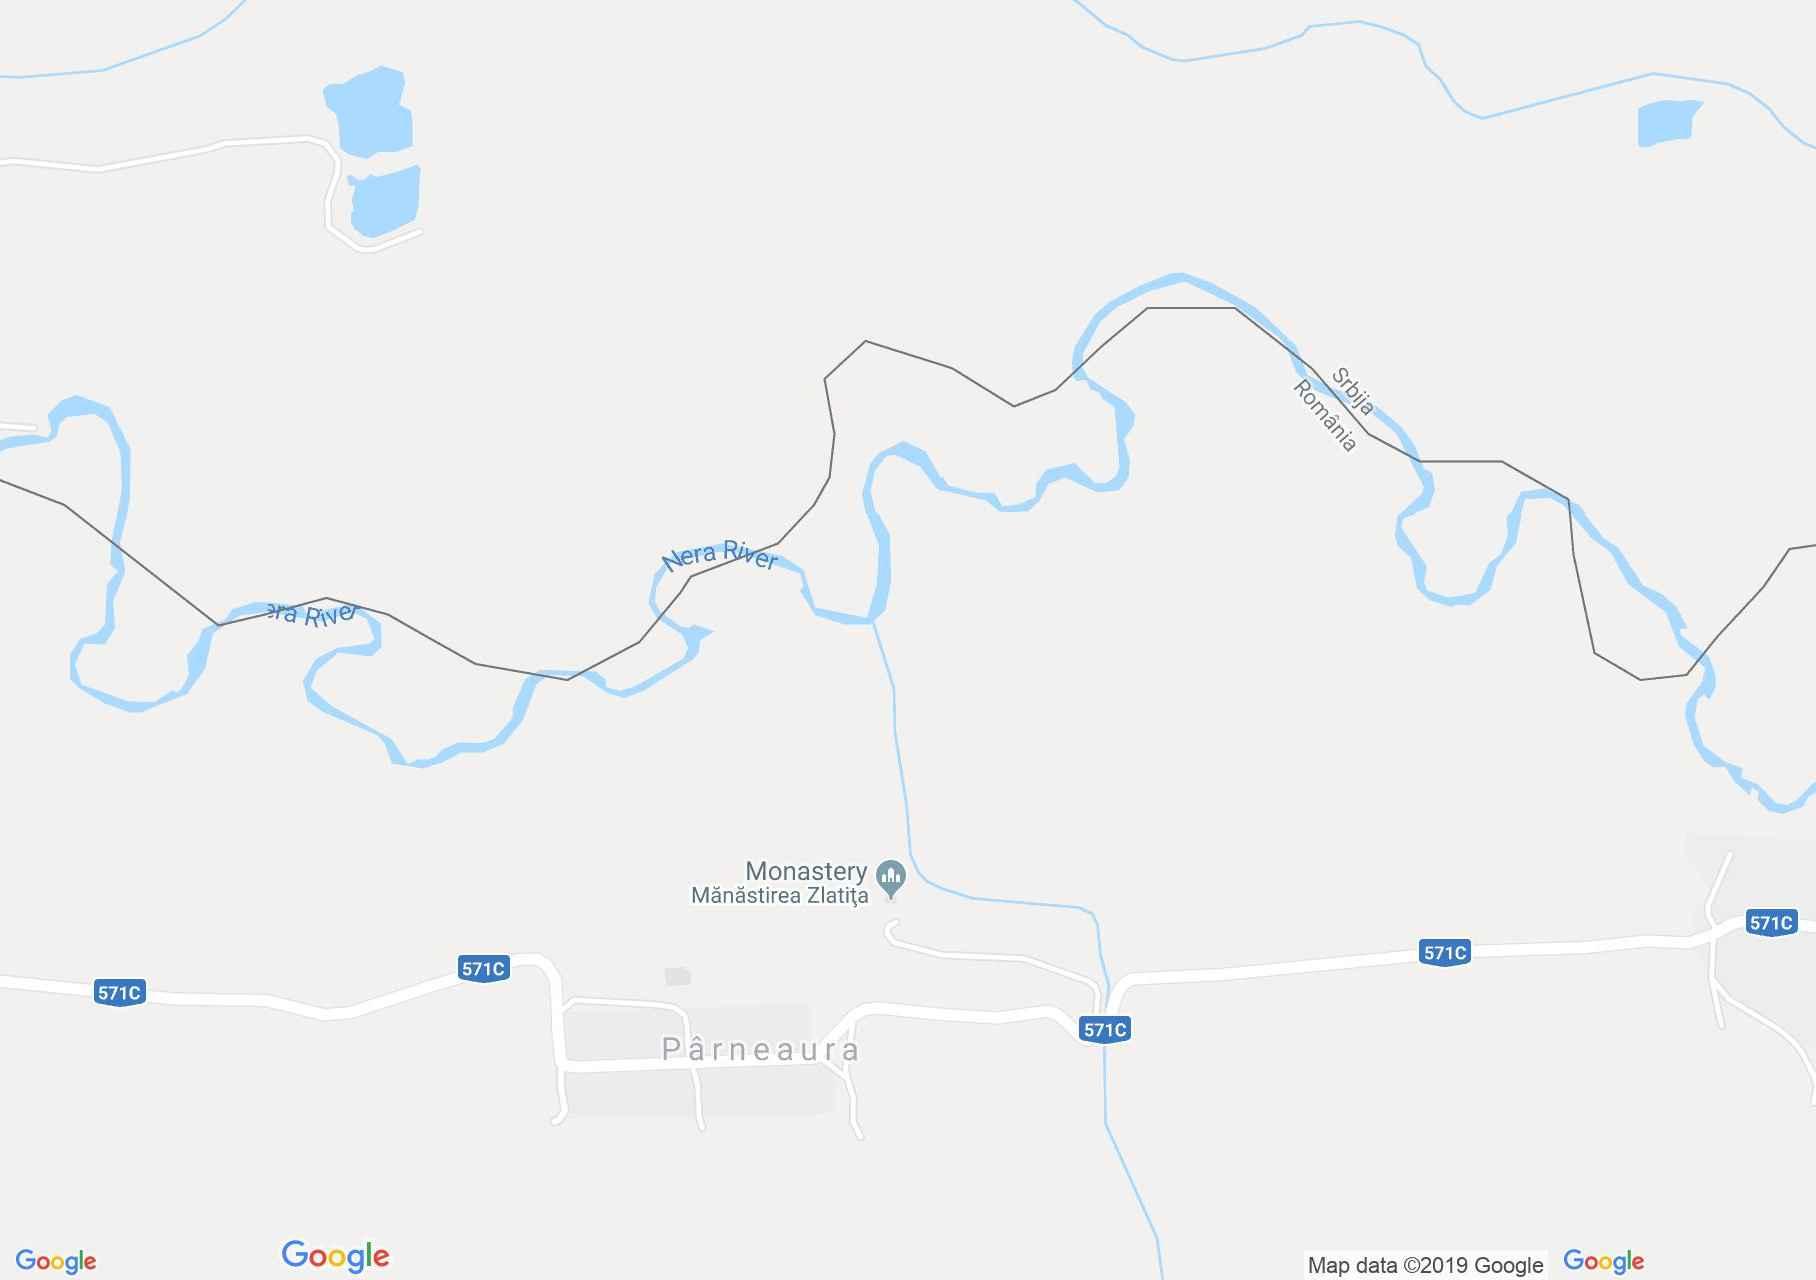 Pârneaura: Zlatica kolostor (térkép)